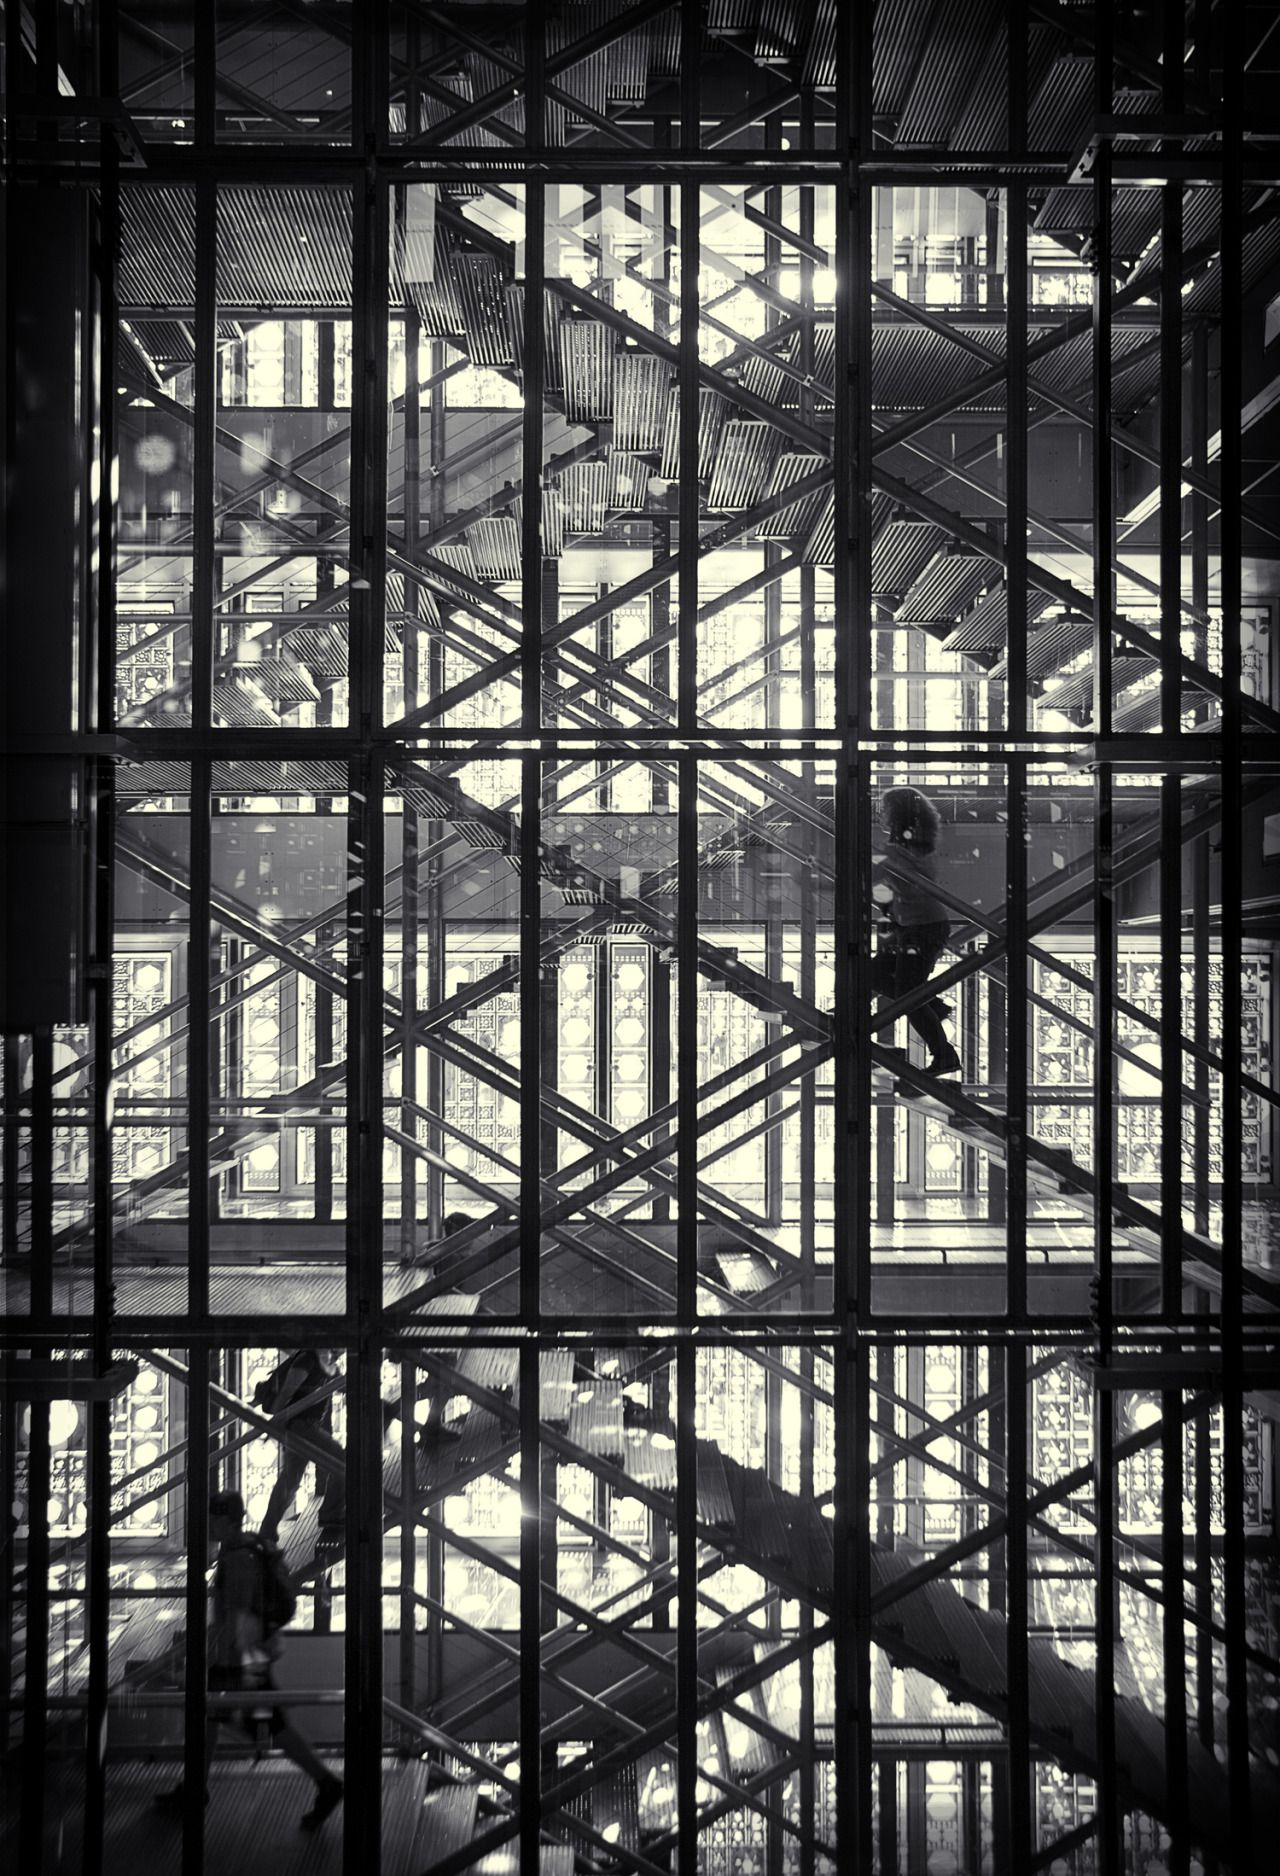 Institut du Monde Arabe. Paris. Jean Nouvel, Gilbert Lezenes, Pierre Soria & Architecture Studio.